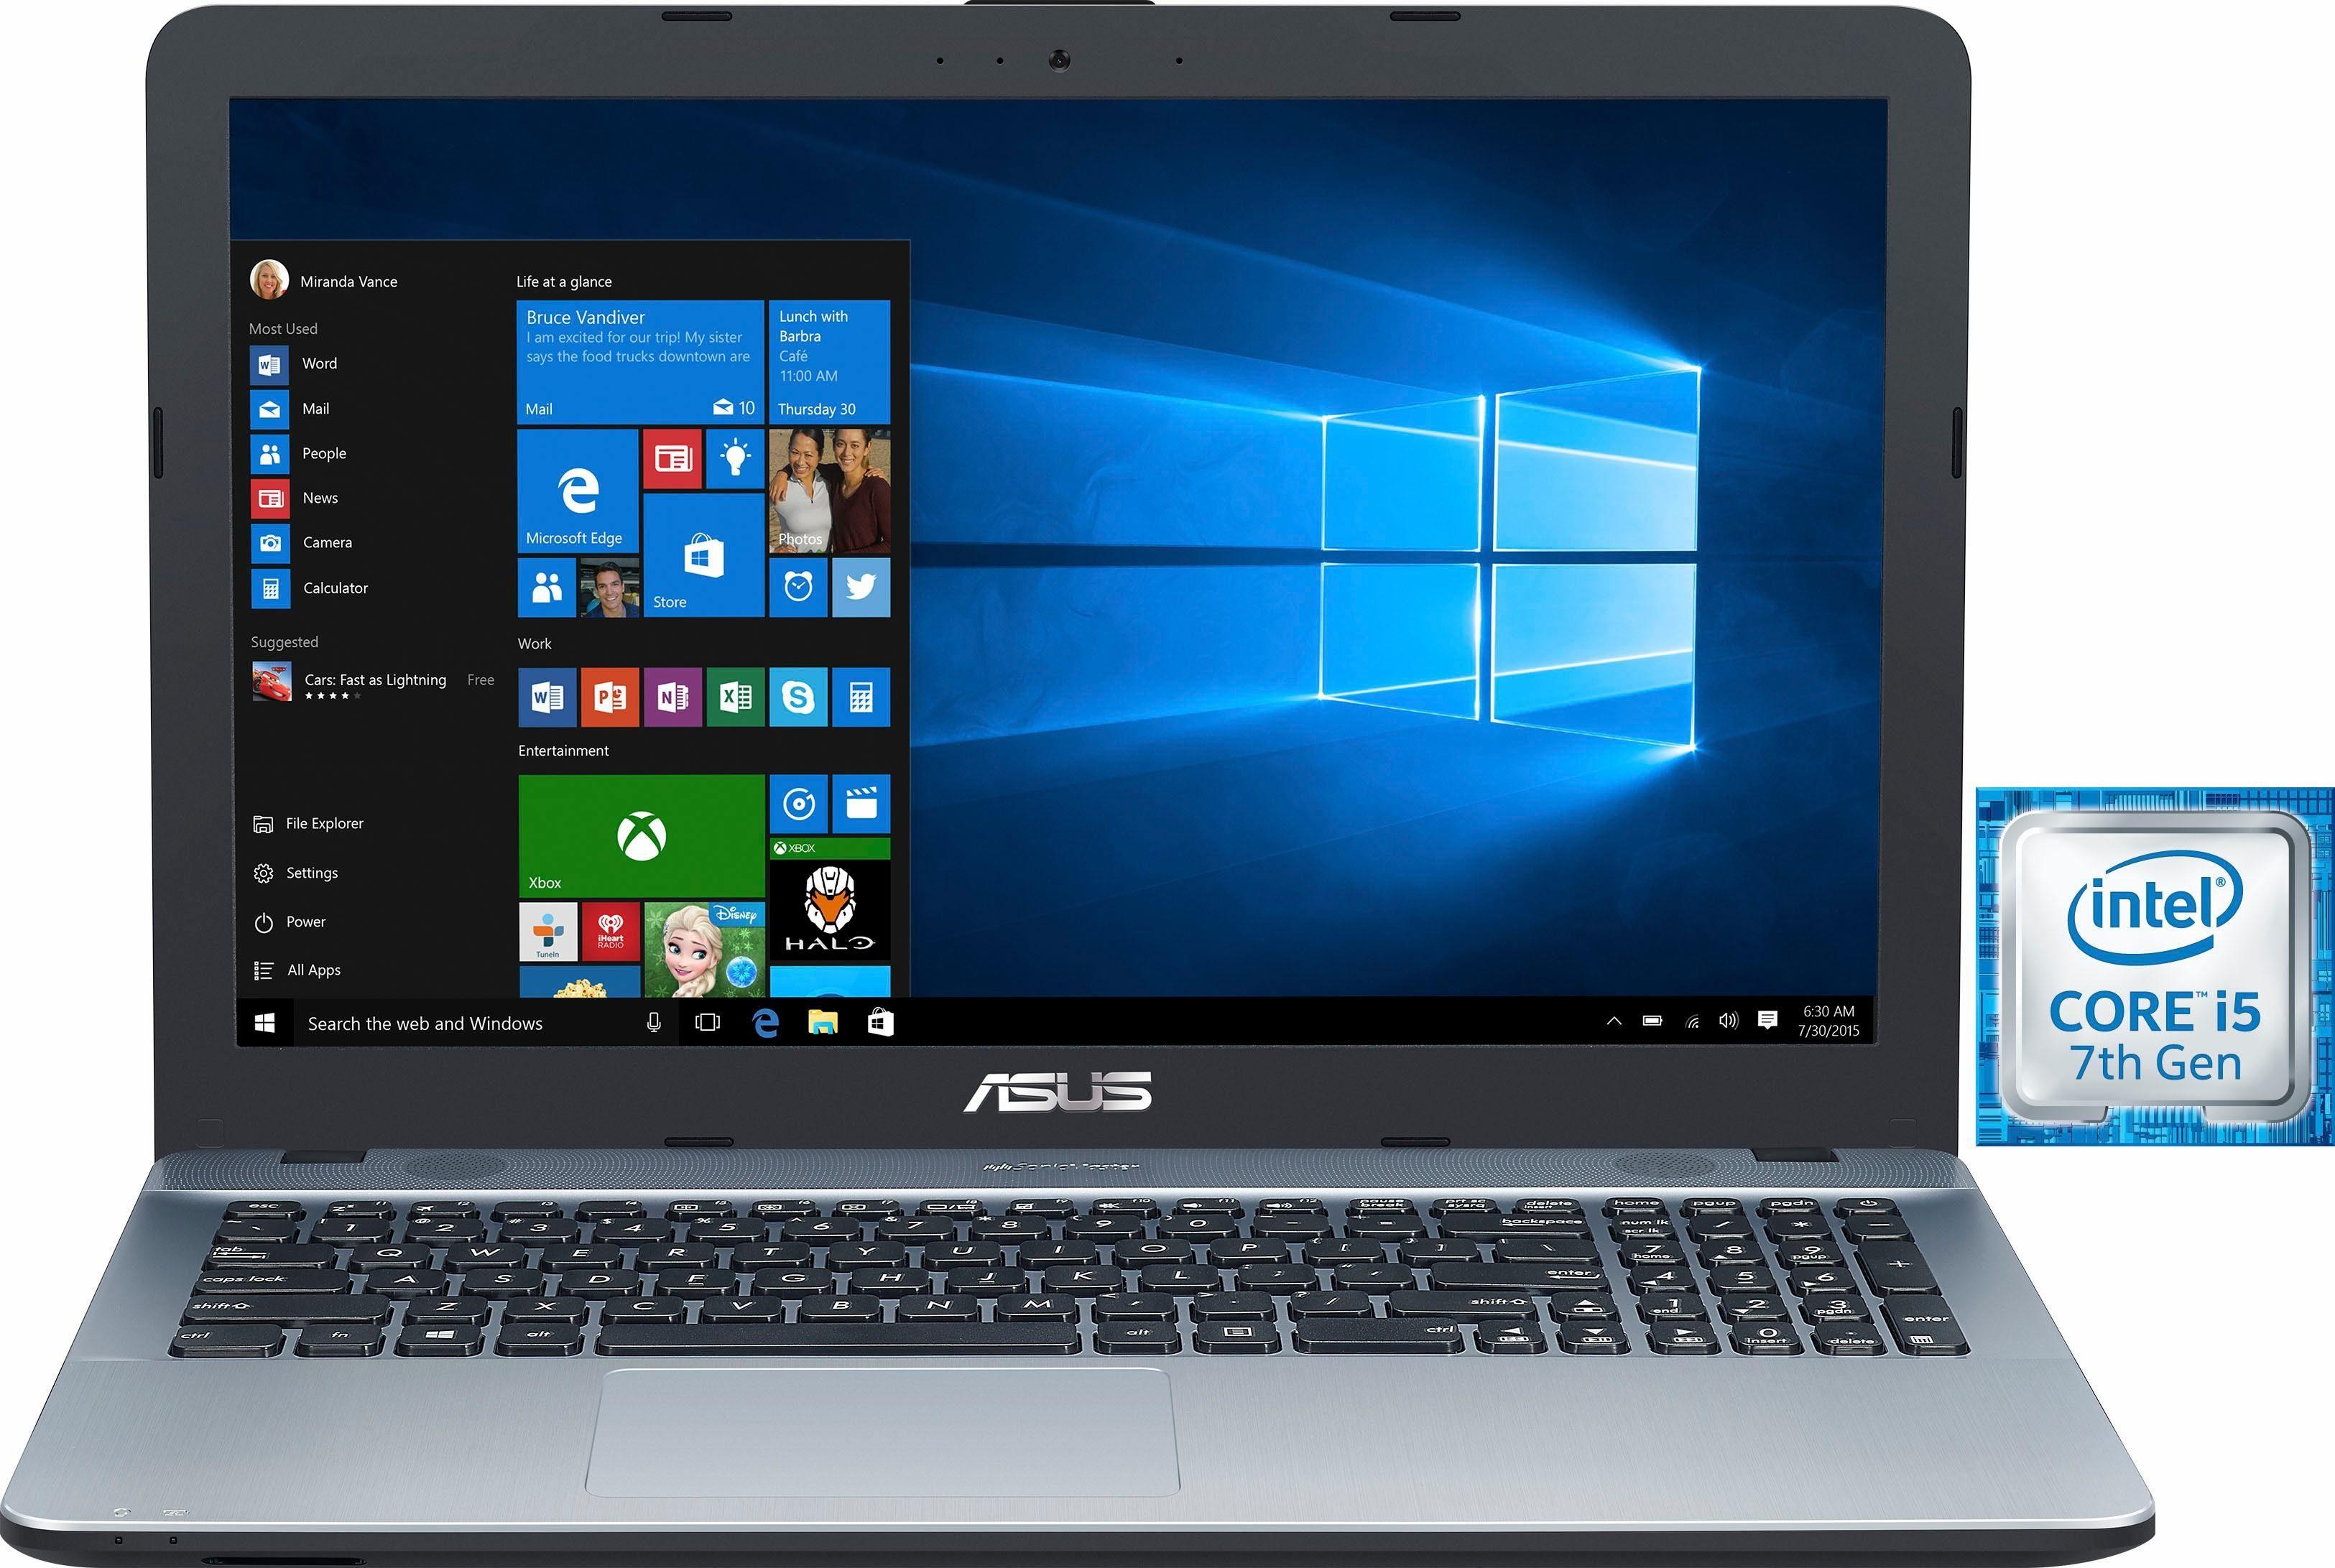 Asus R541UJ-DM265T Notebook (39,6 cm/15,6 Zoll, Intel Core i5, GeForce, 1000 GB HDD)